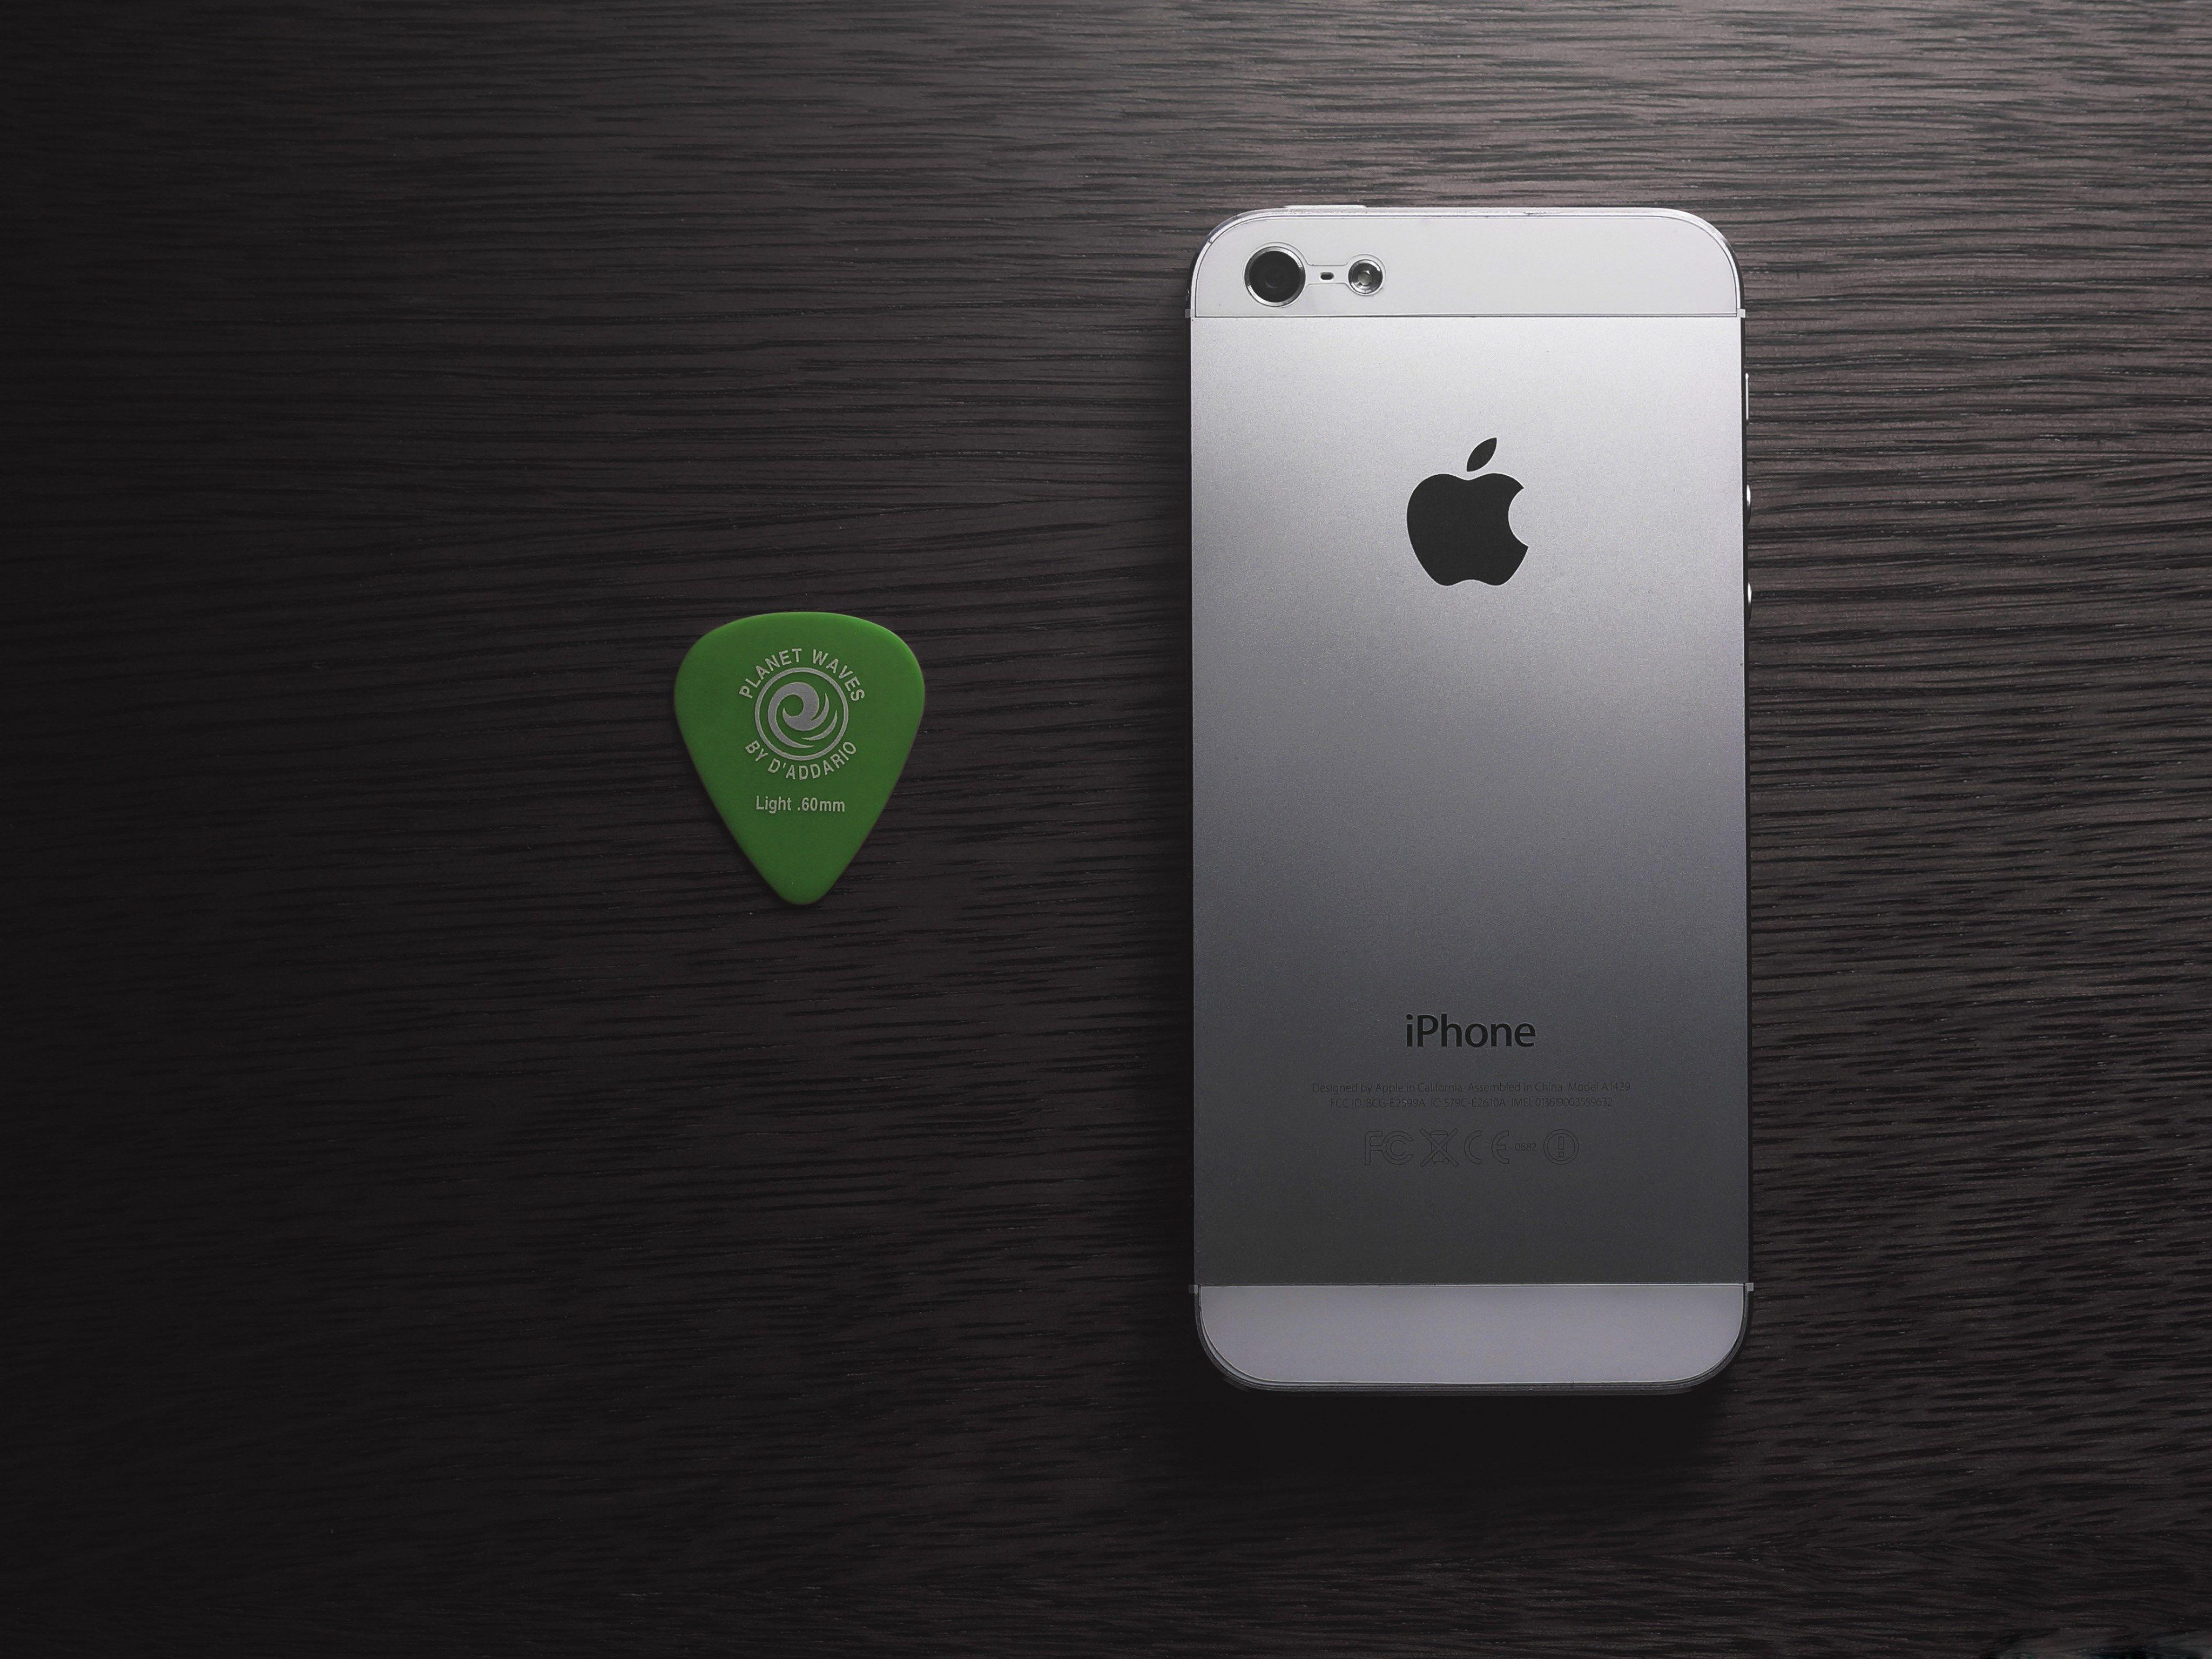 Wallpaper download for iphone - Desktop Hd Iphone 5 Wallpapers Free Download